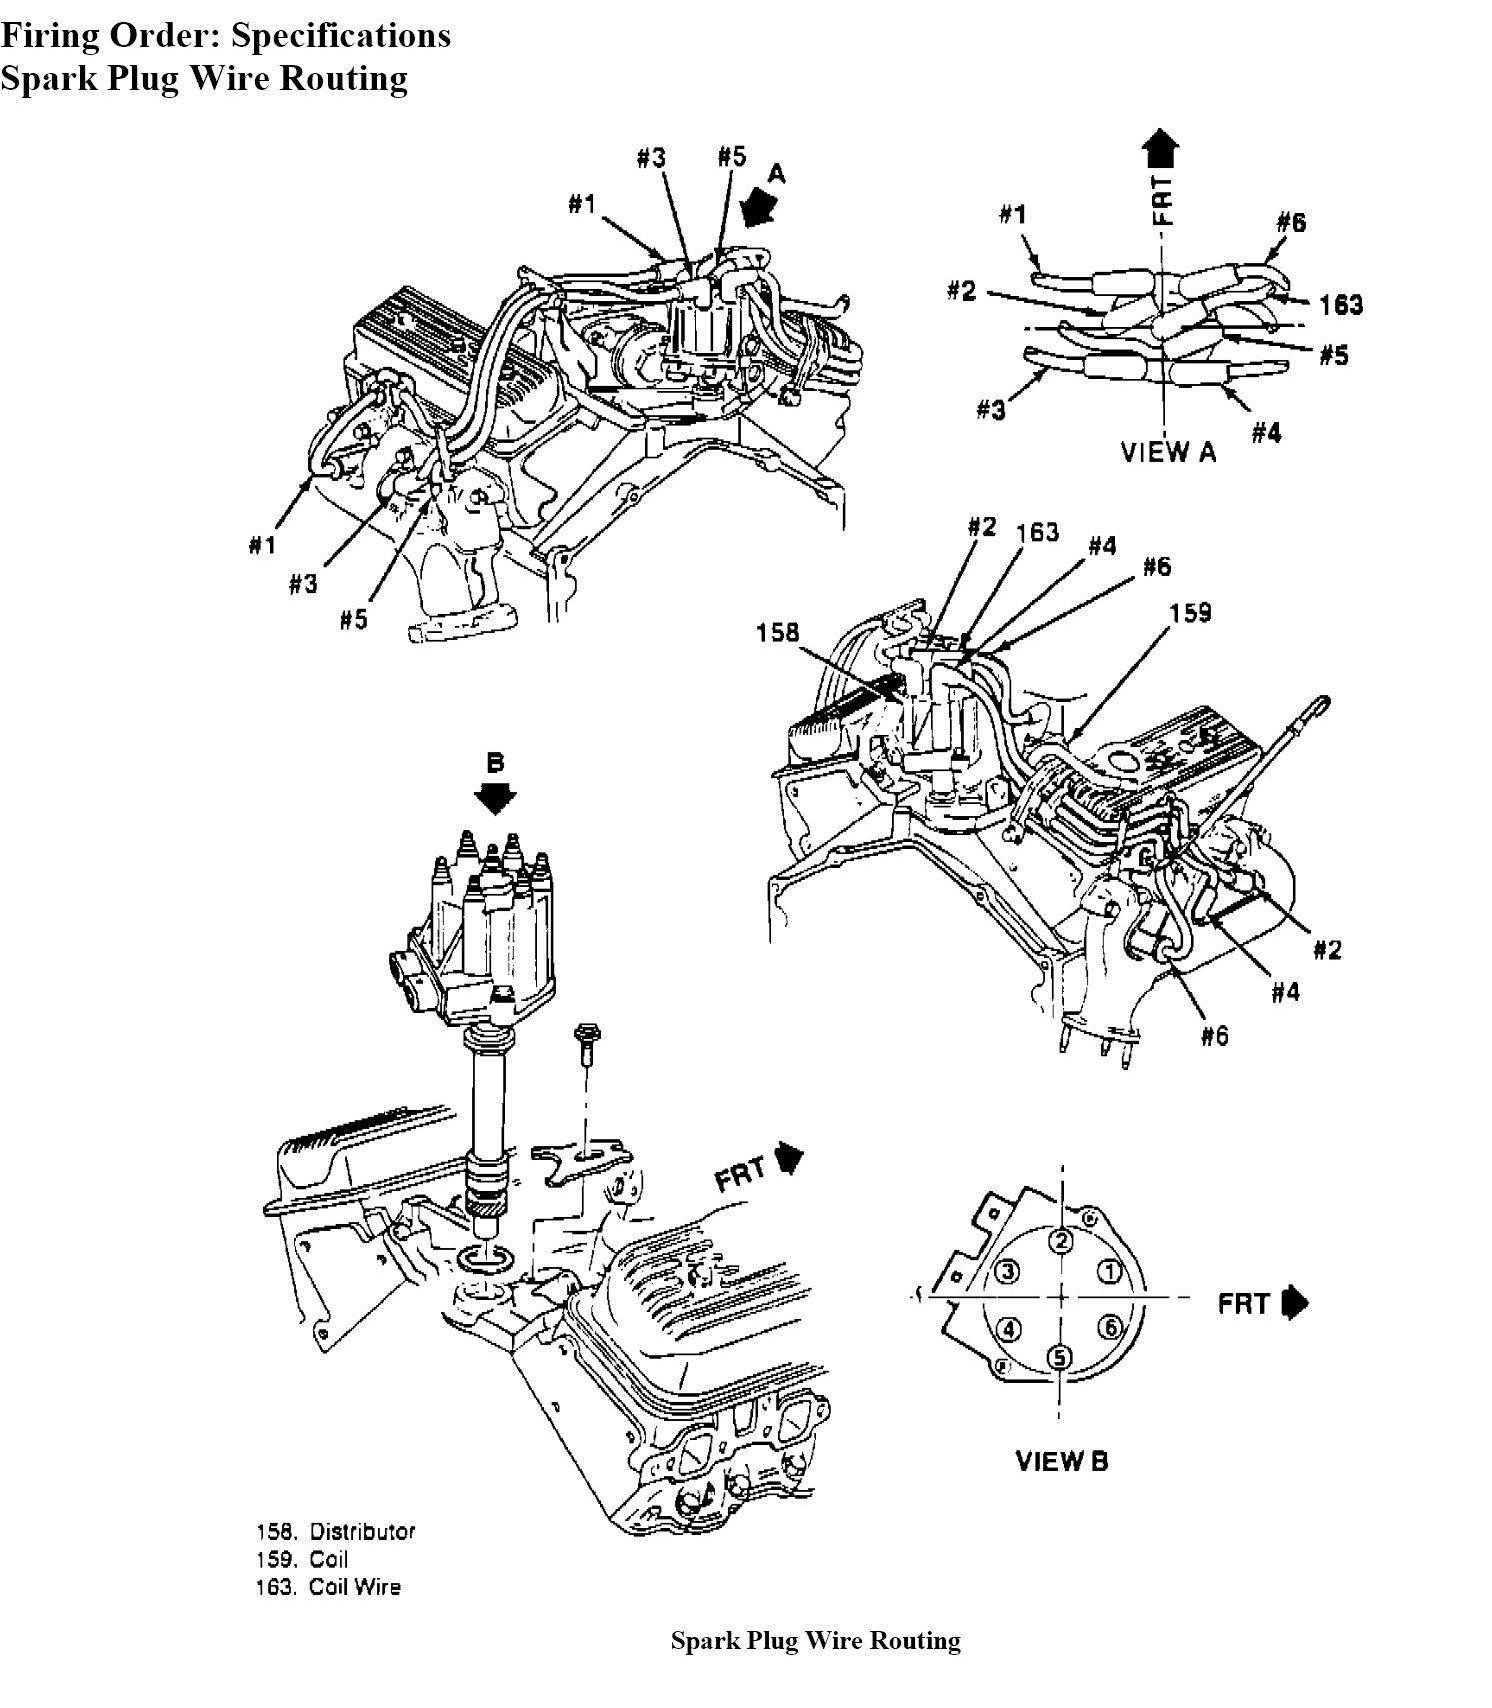 1989 Chevy Blazer S